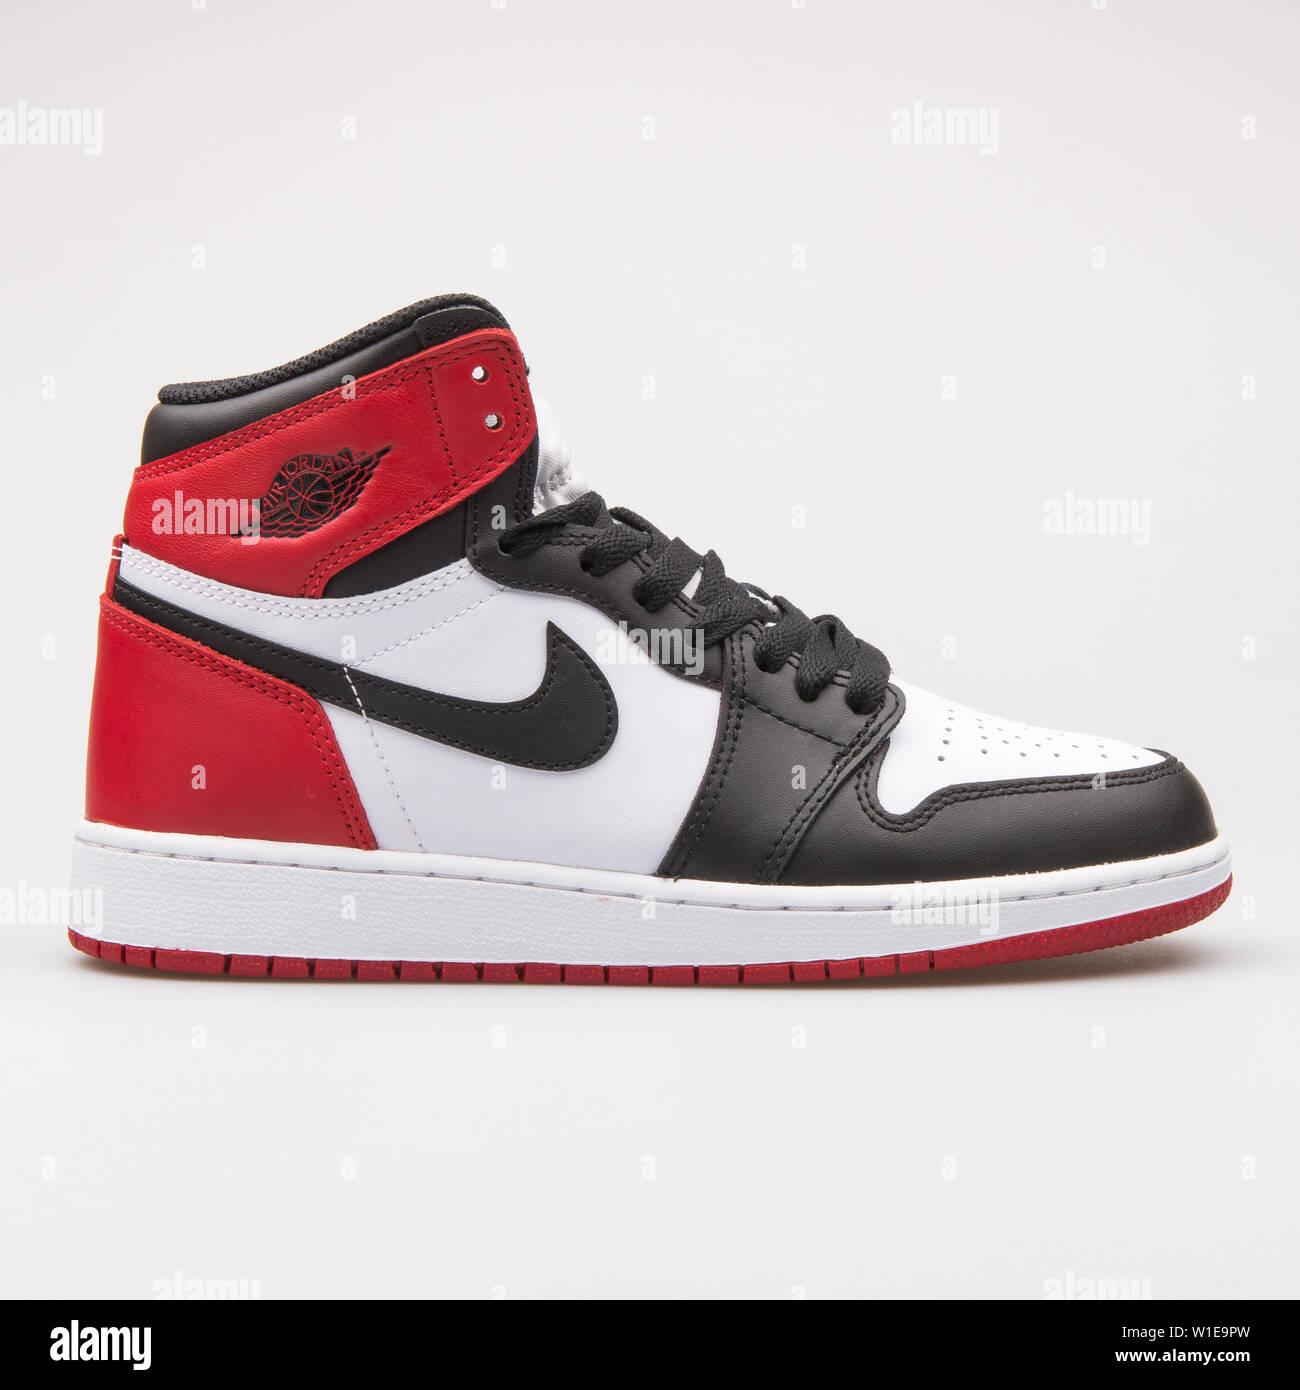 air jordan 1 blancas y rojas Shop Clothing & Shoes Online